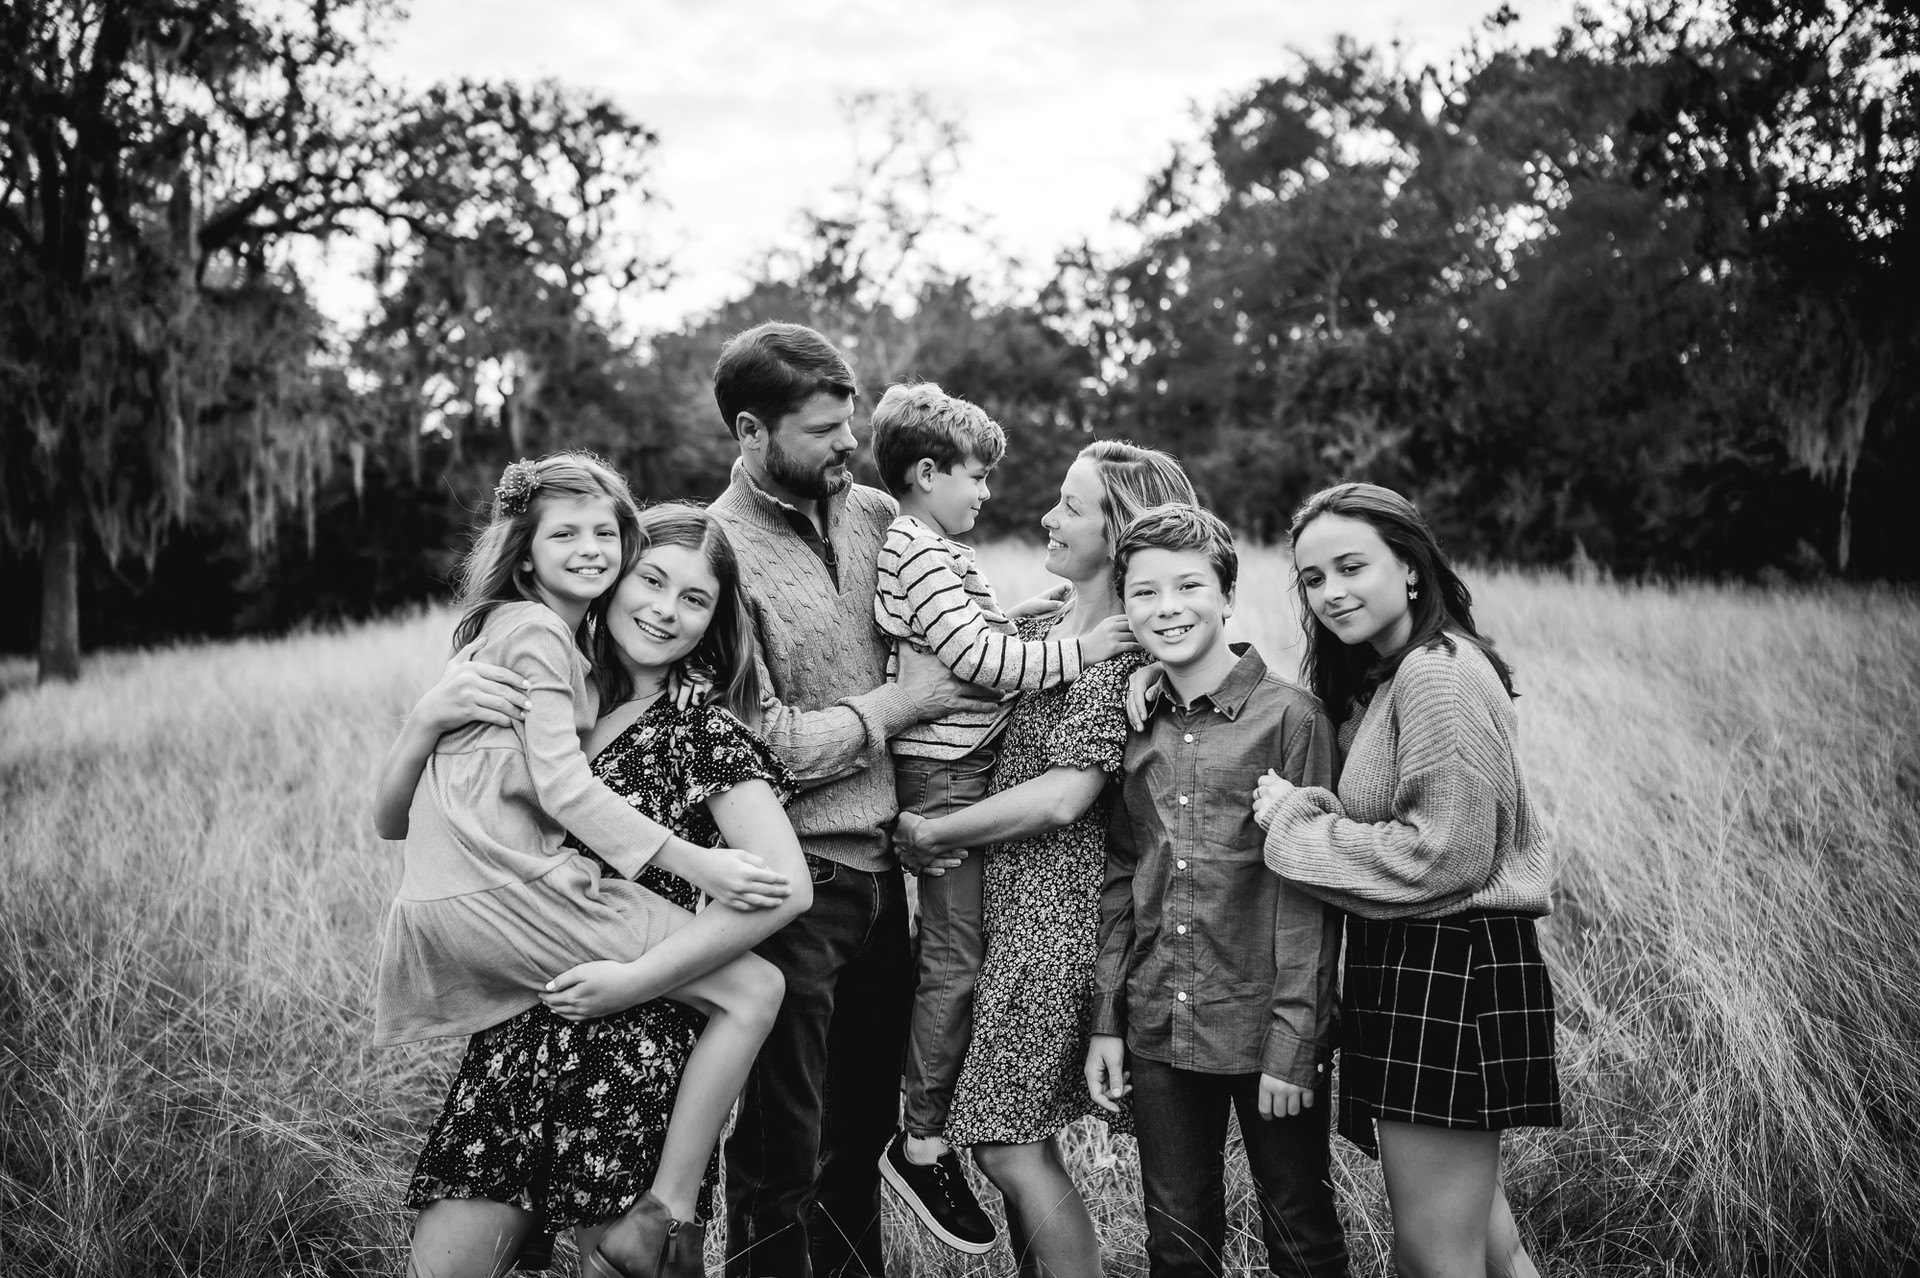 Katy_family_photographer-1-9.jpg